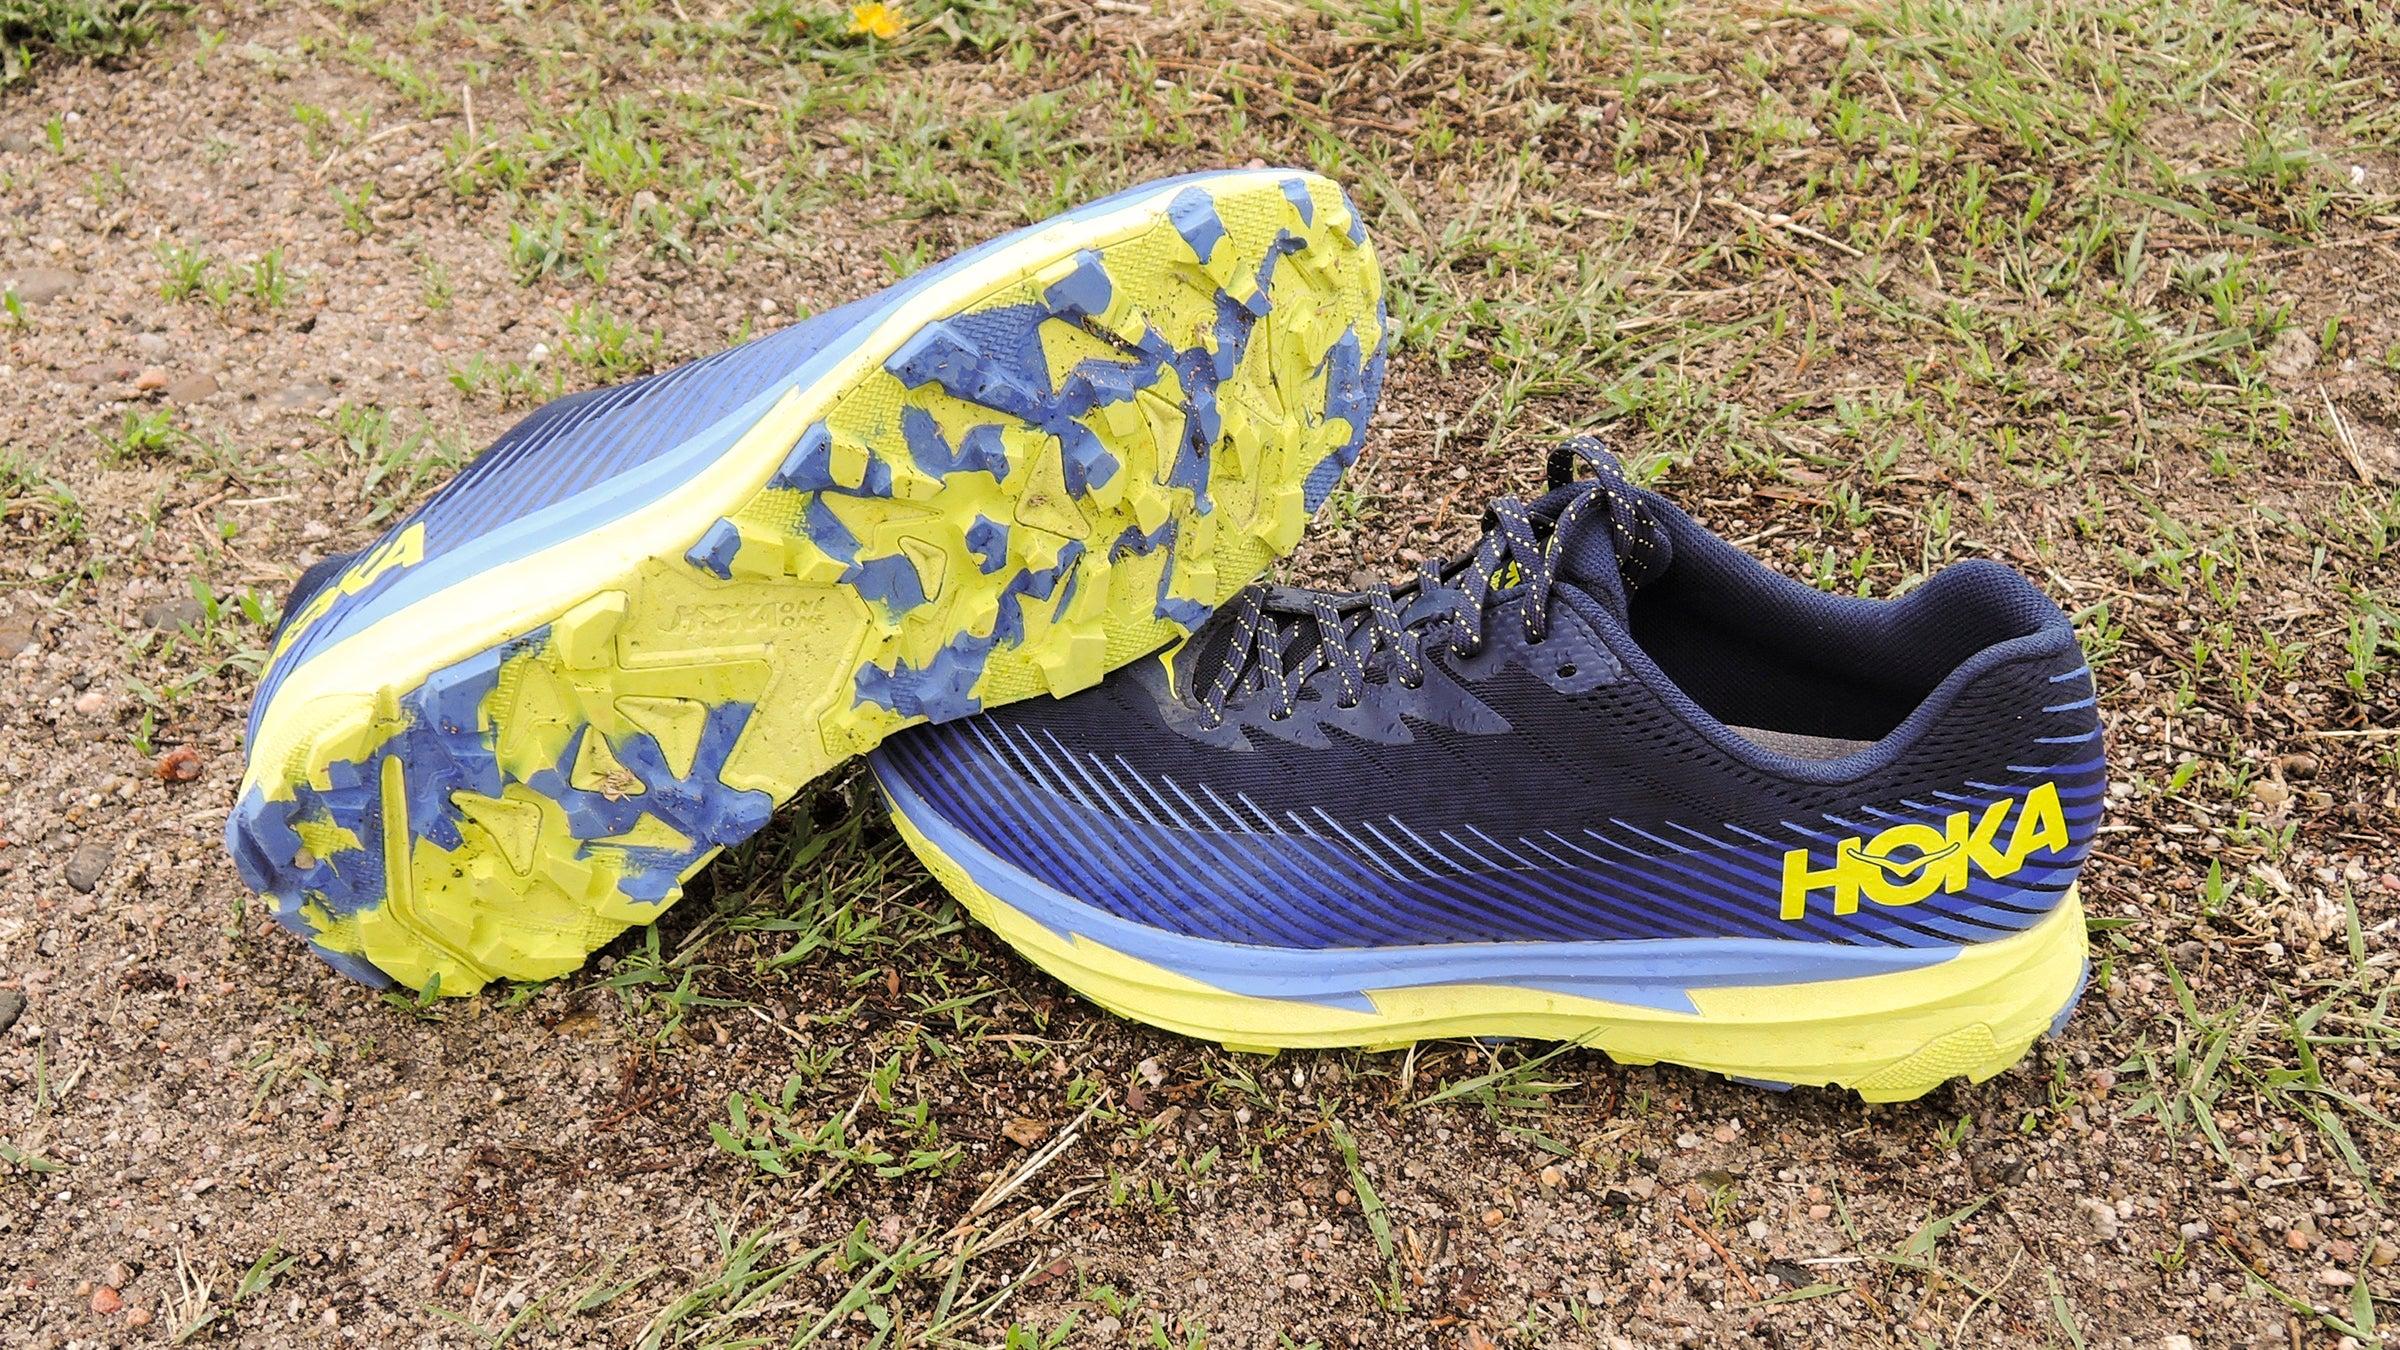 HOKA Torrent 2 trail shoe